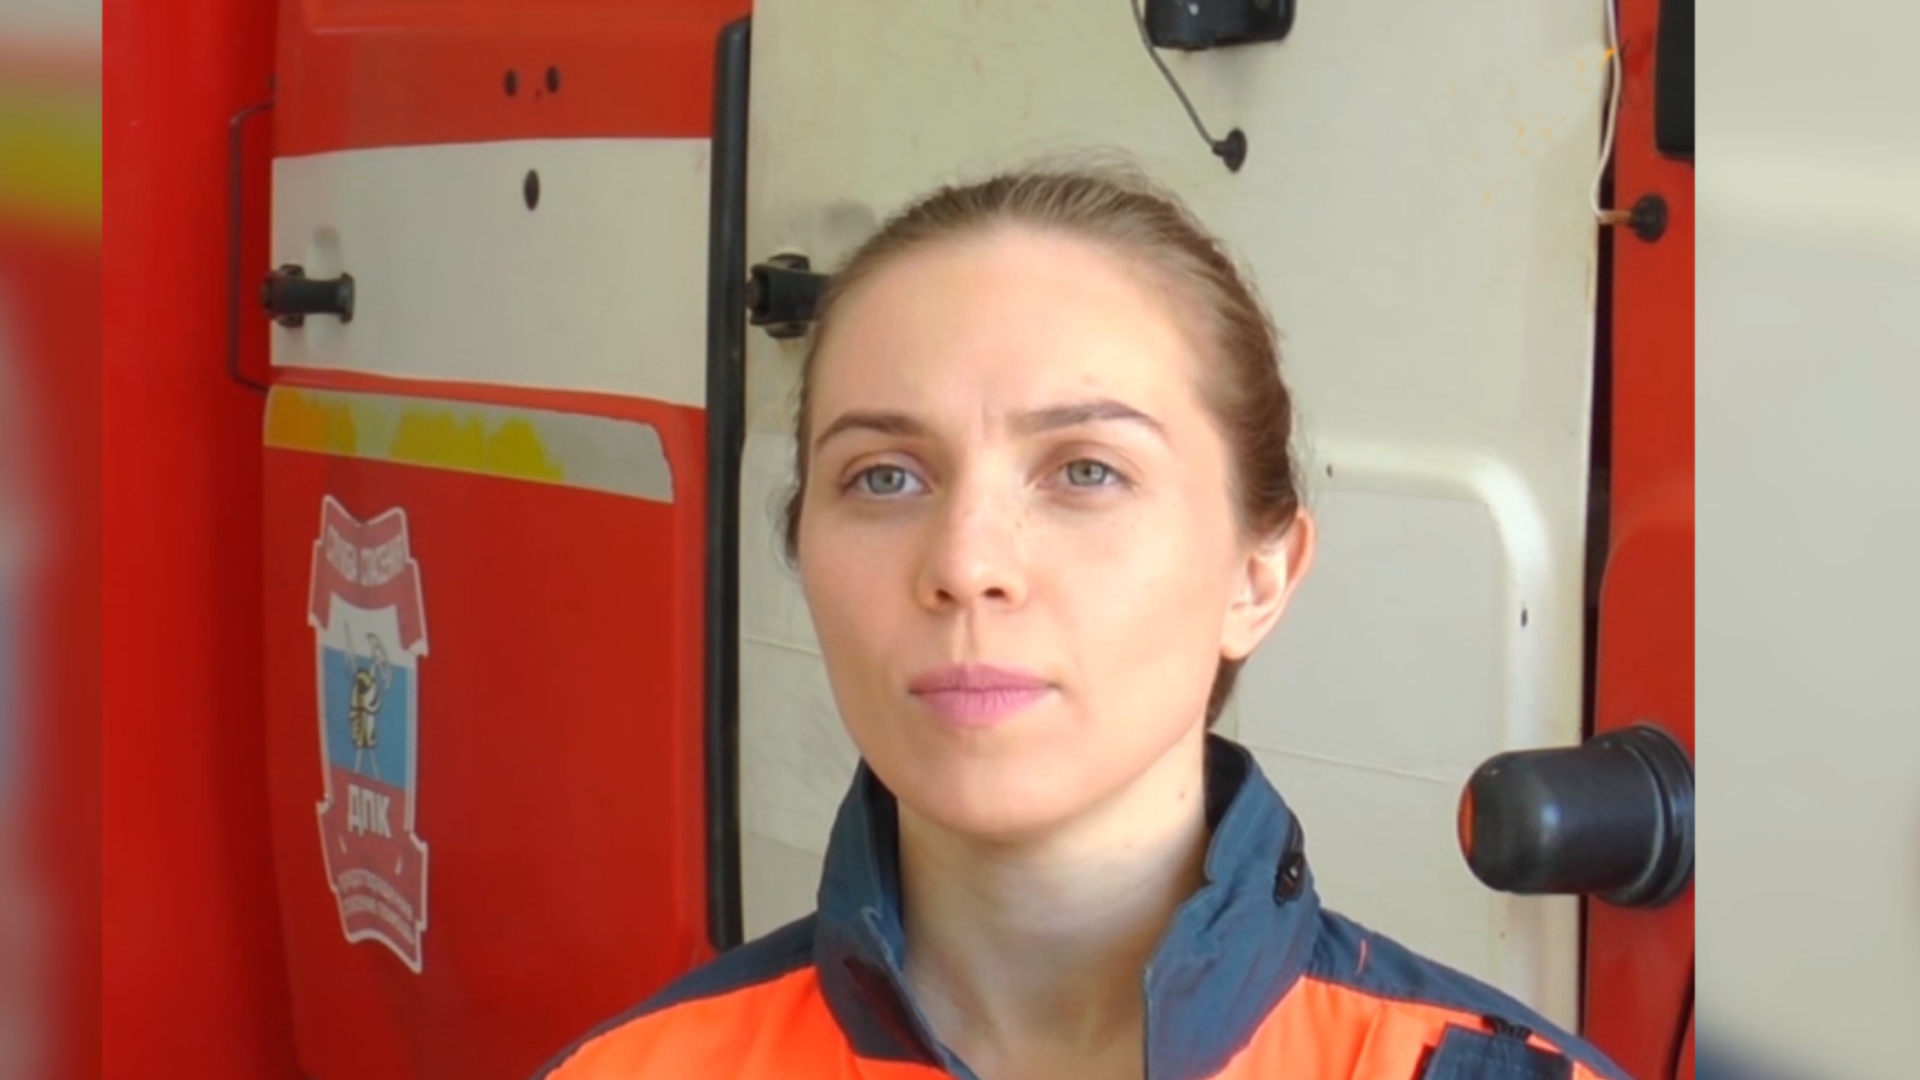 Elena Dimitriu: conductora de un camión de bomberos - Sputnik Mundo, 1920, 03.04.2021